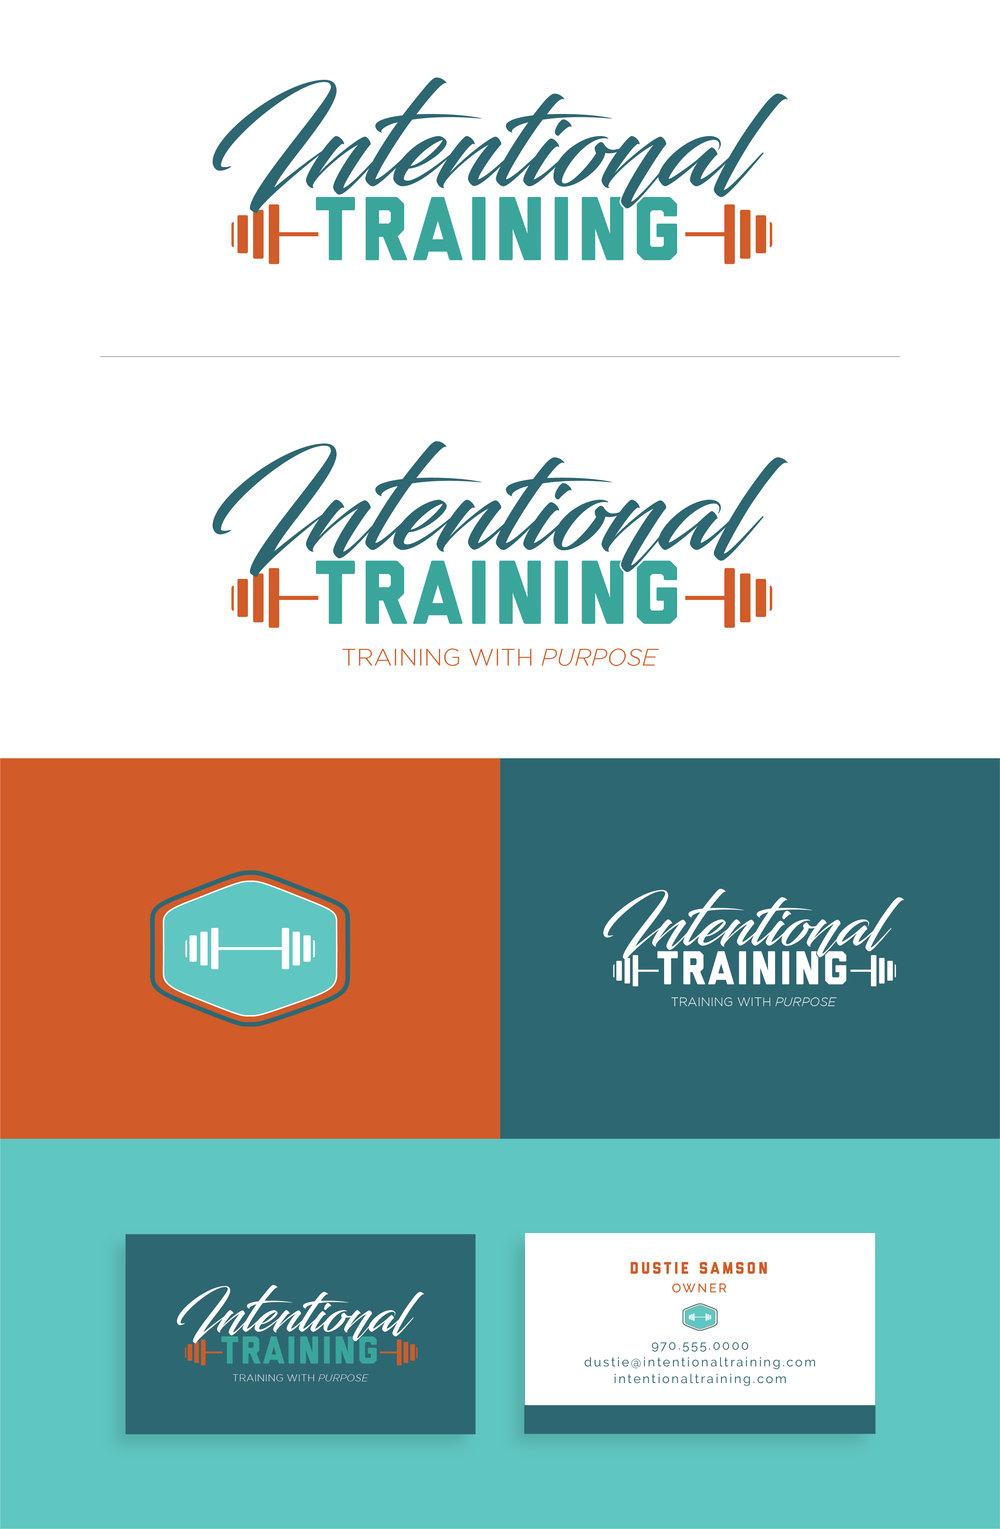 IntentionalTraining_FirstLook-02.jpg